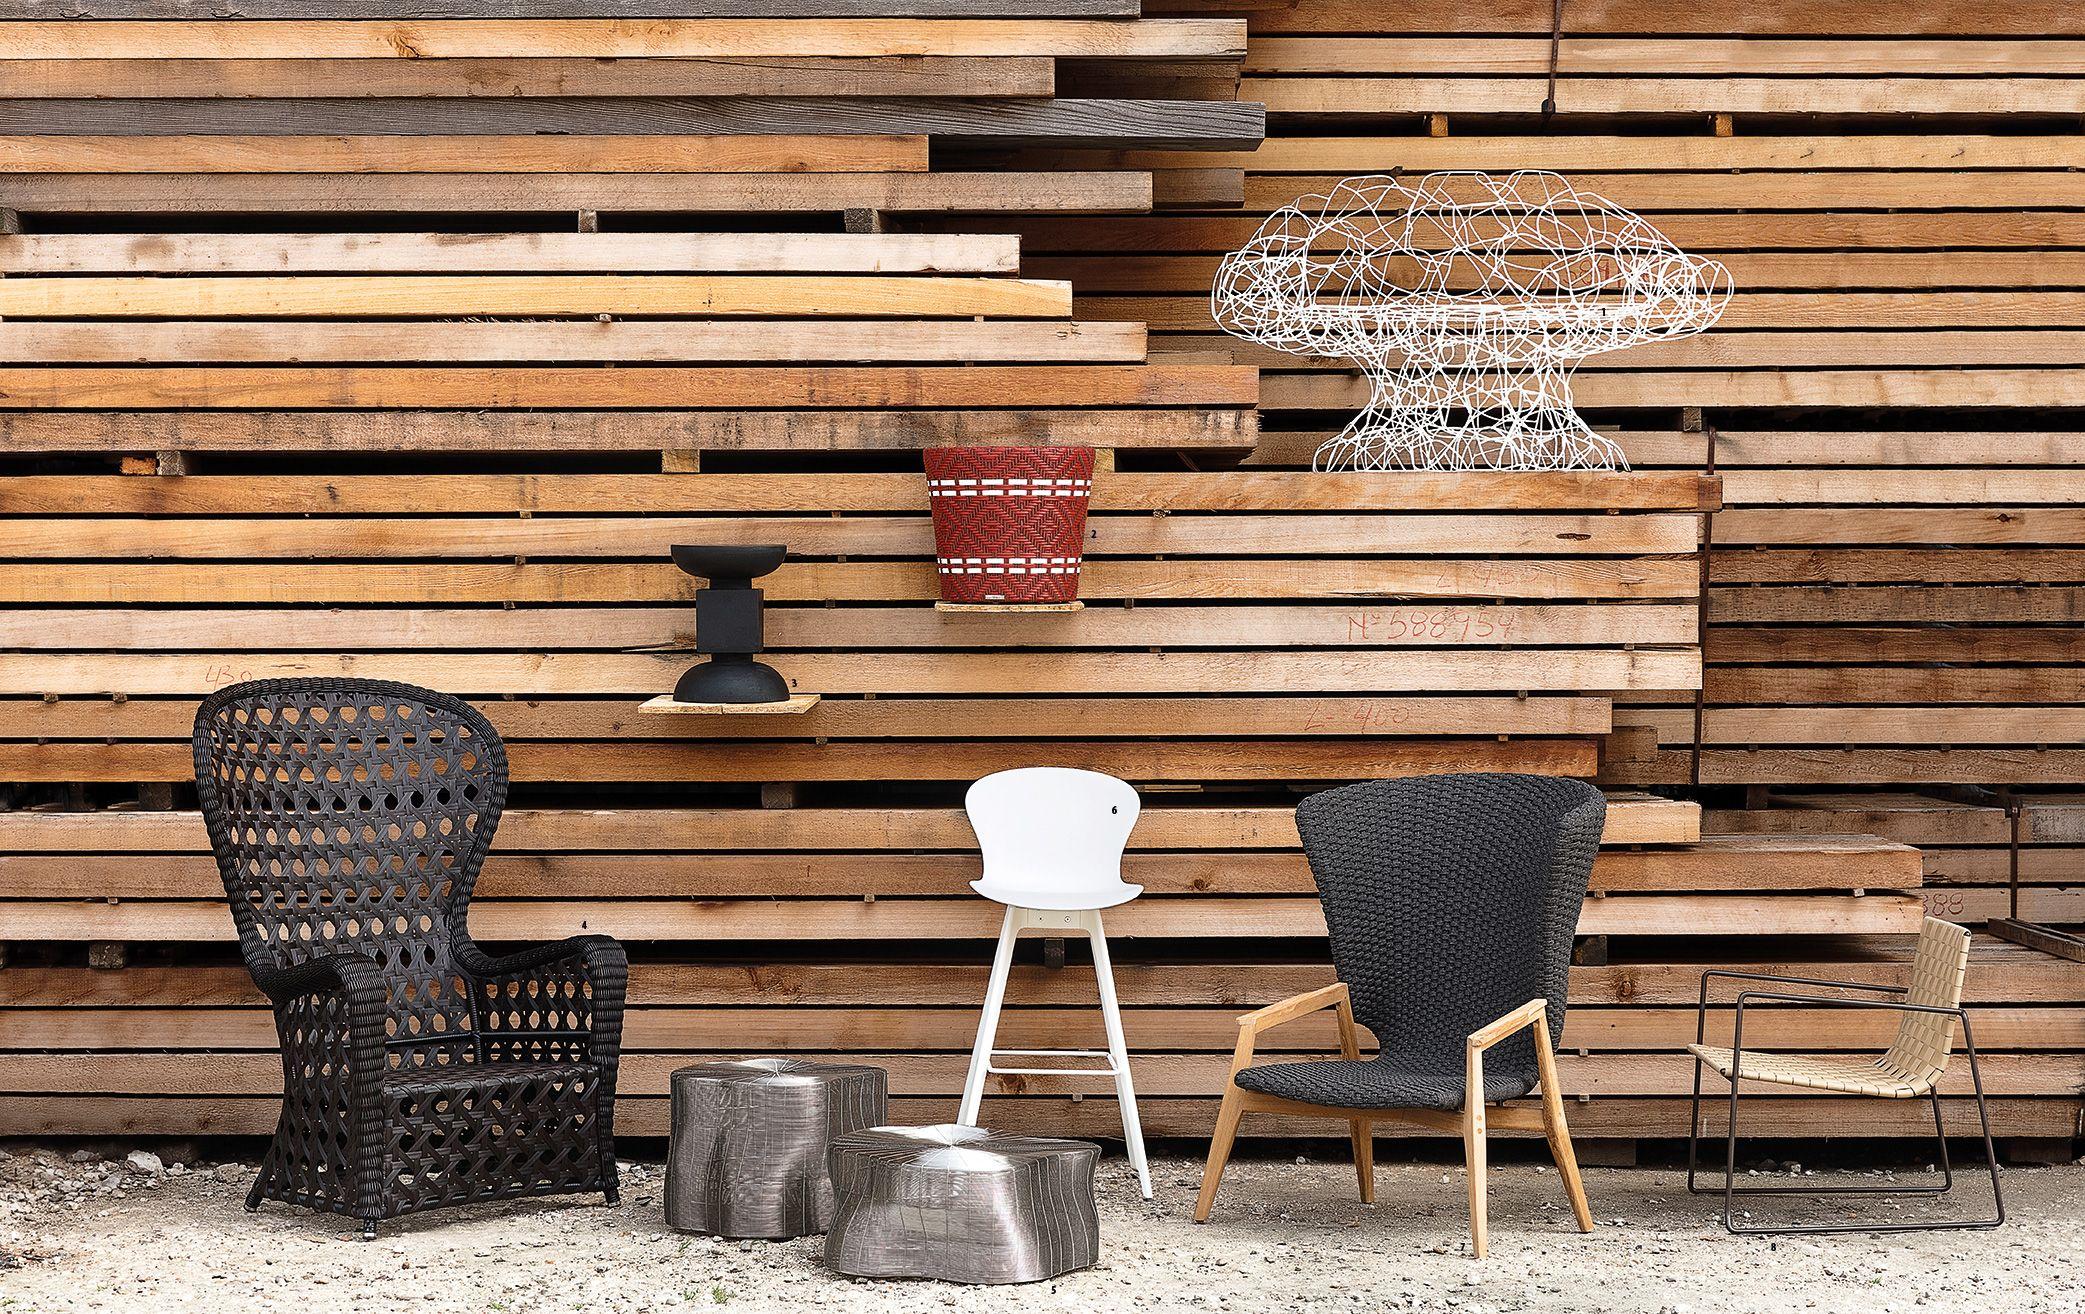 Muebles de exterior: Craft & design